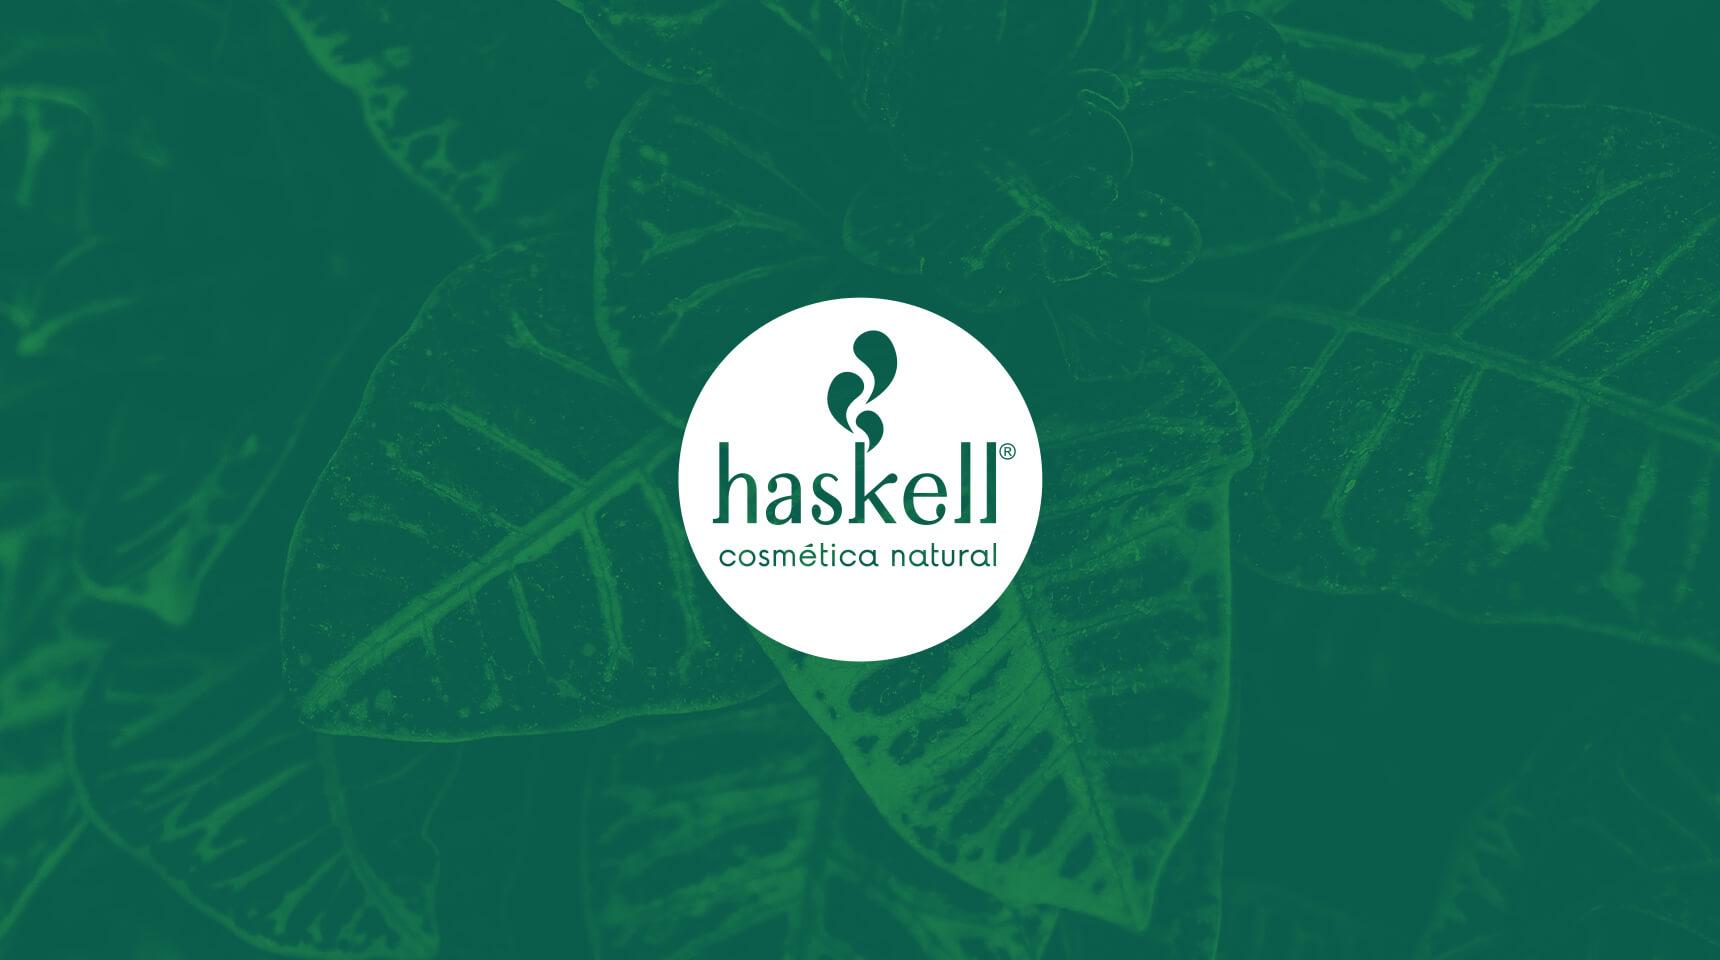 firmorama_haskell_02